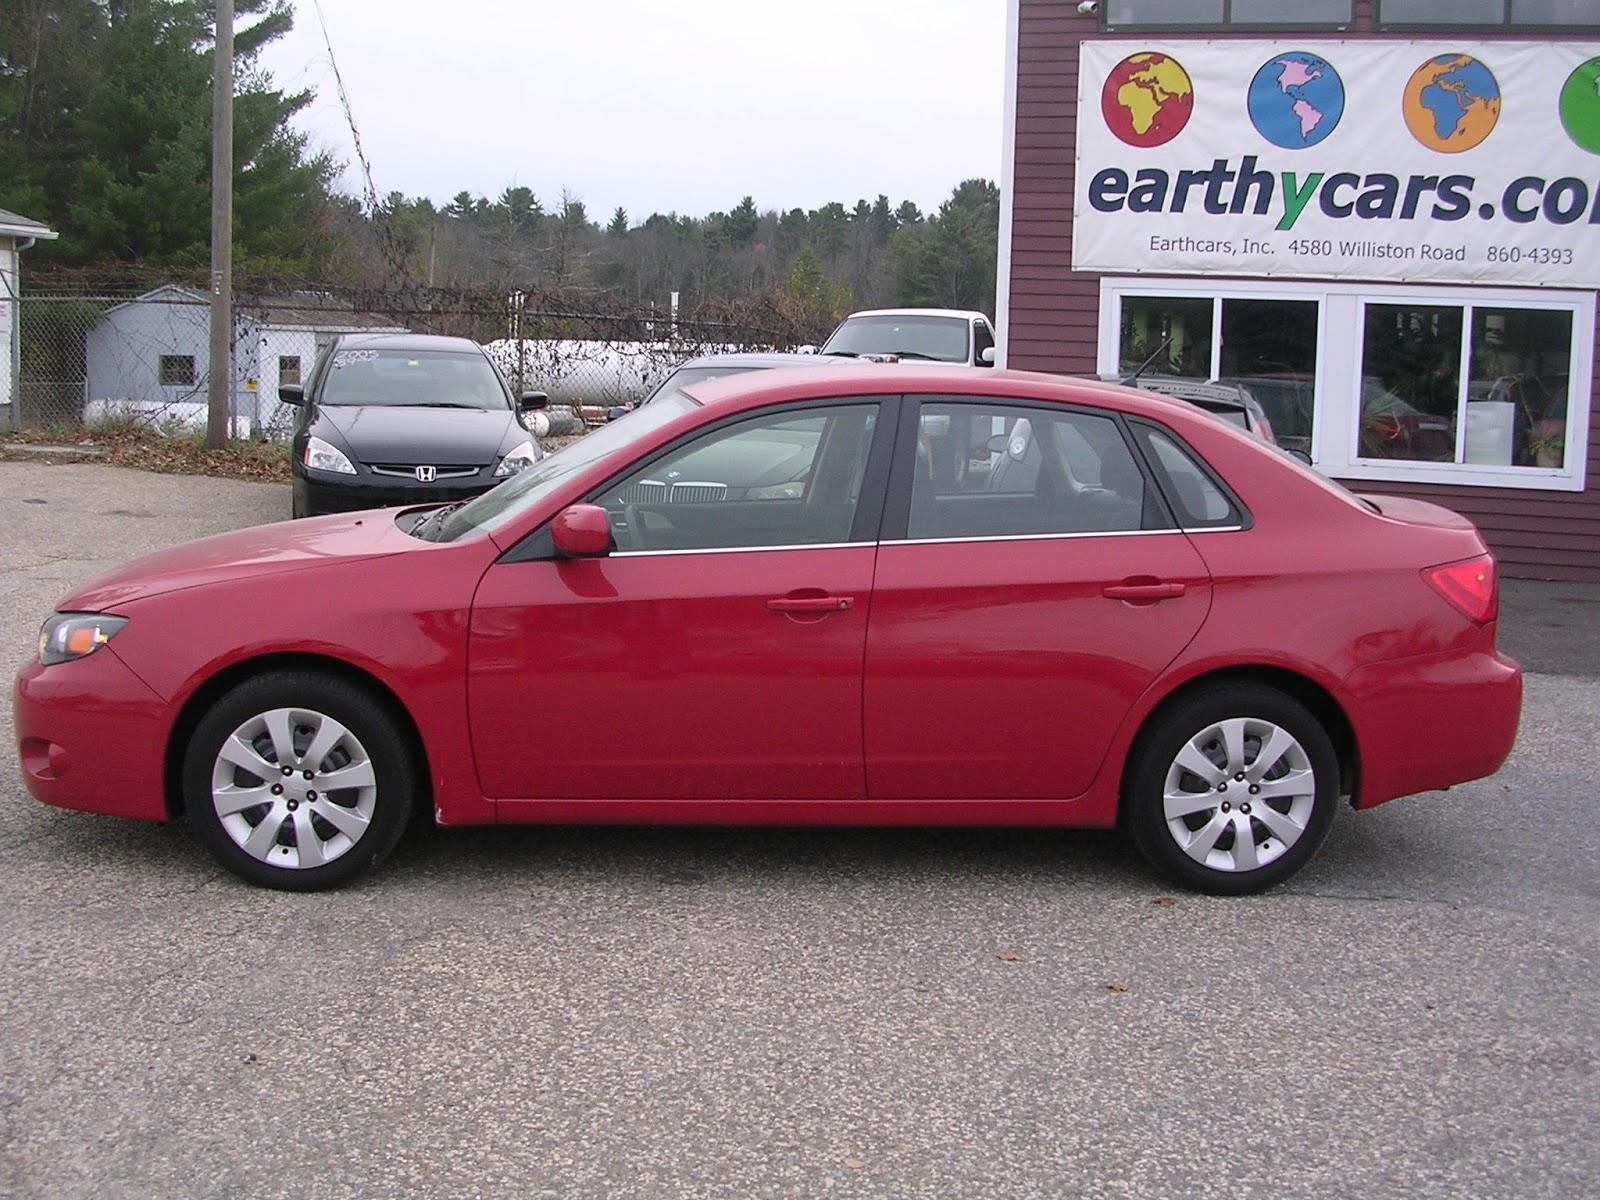 Earthy Cars Blog: March 2013